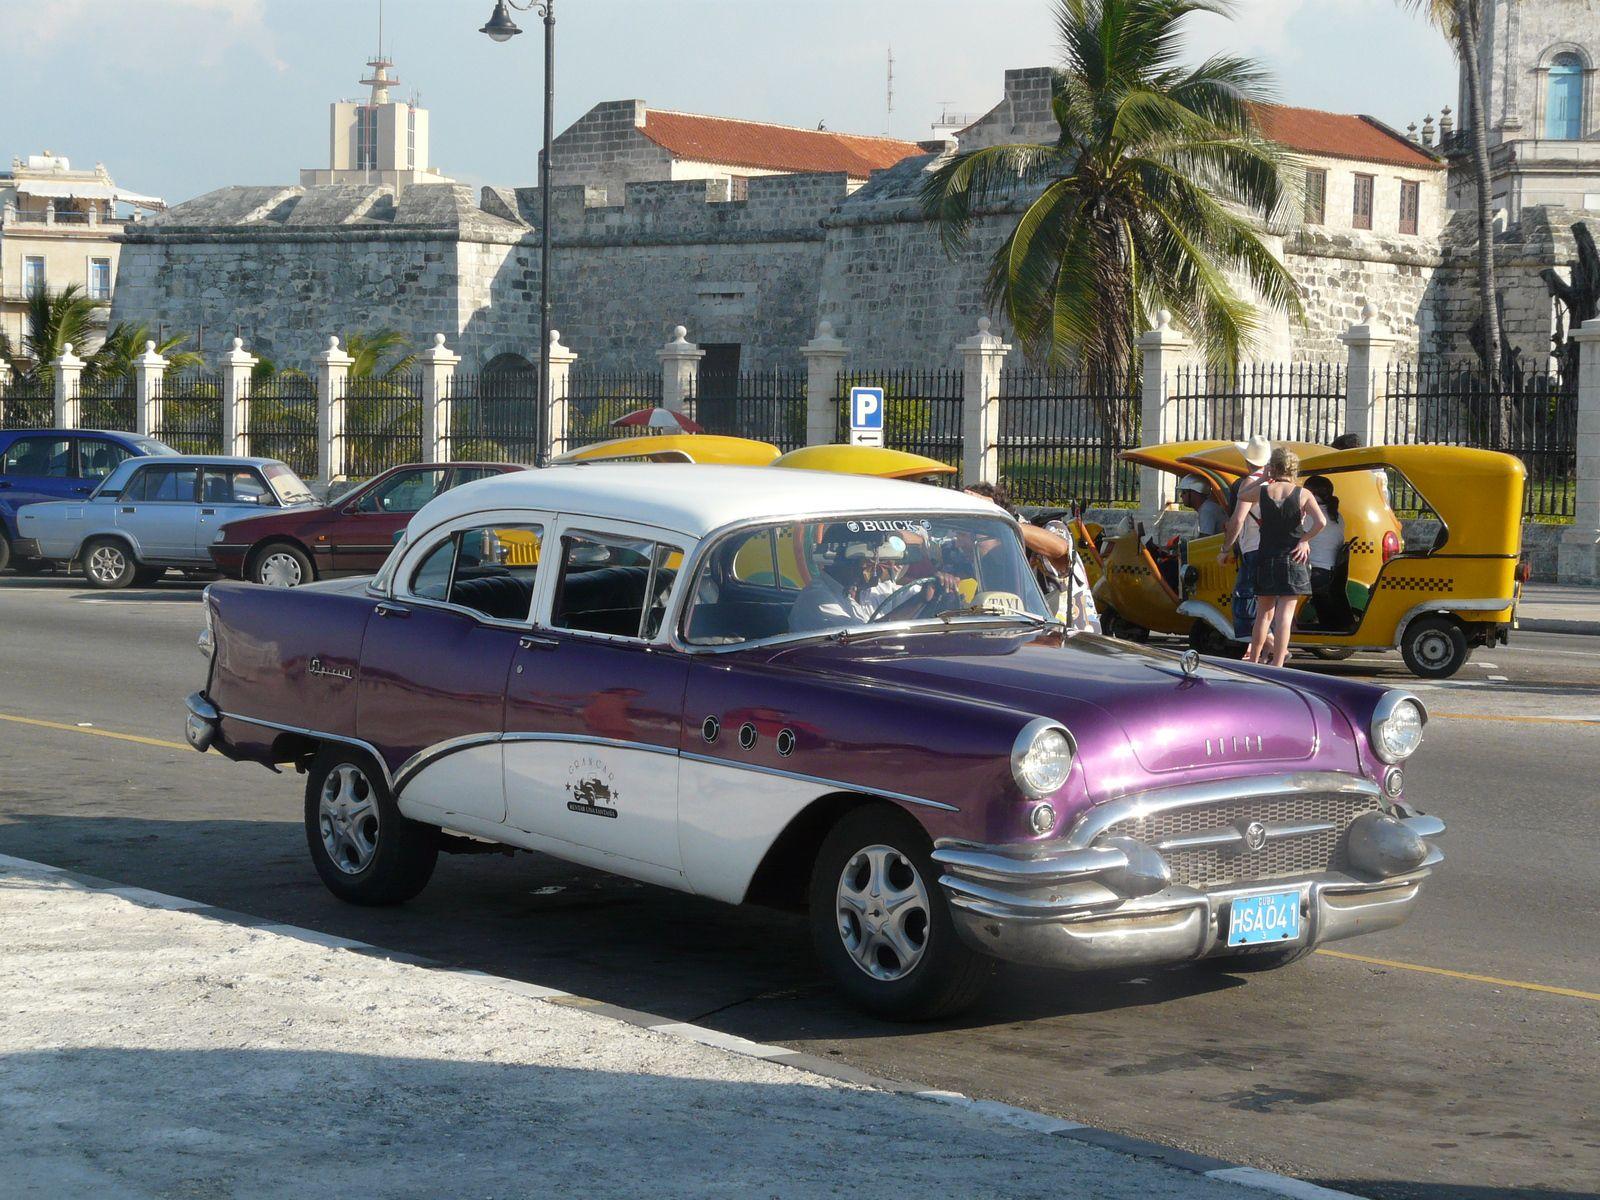 Crème au vieux rhum et mangue poêlée - balade cubaine